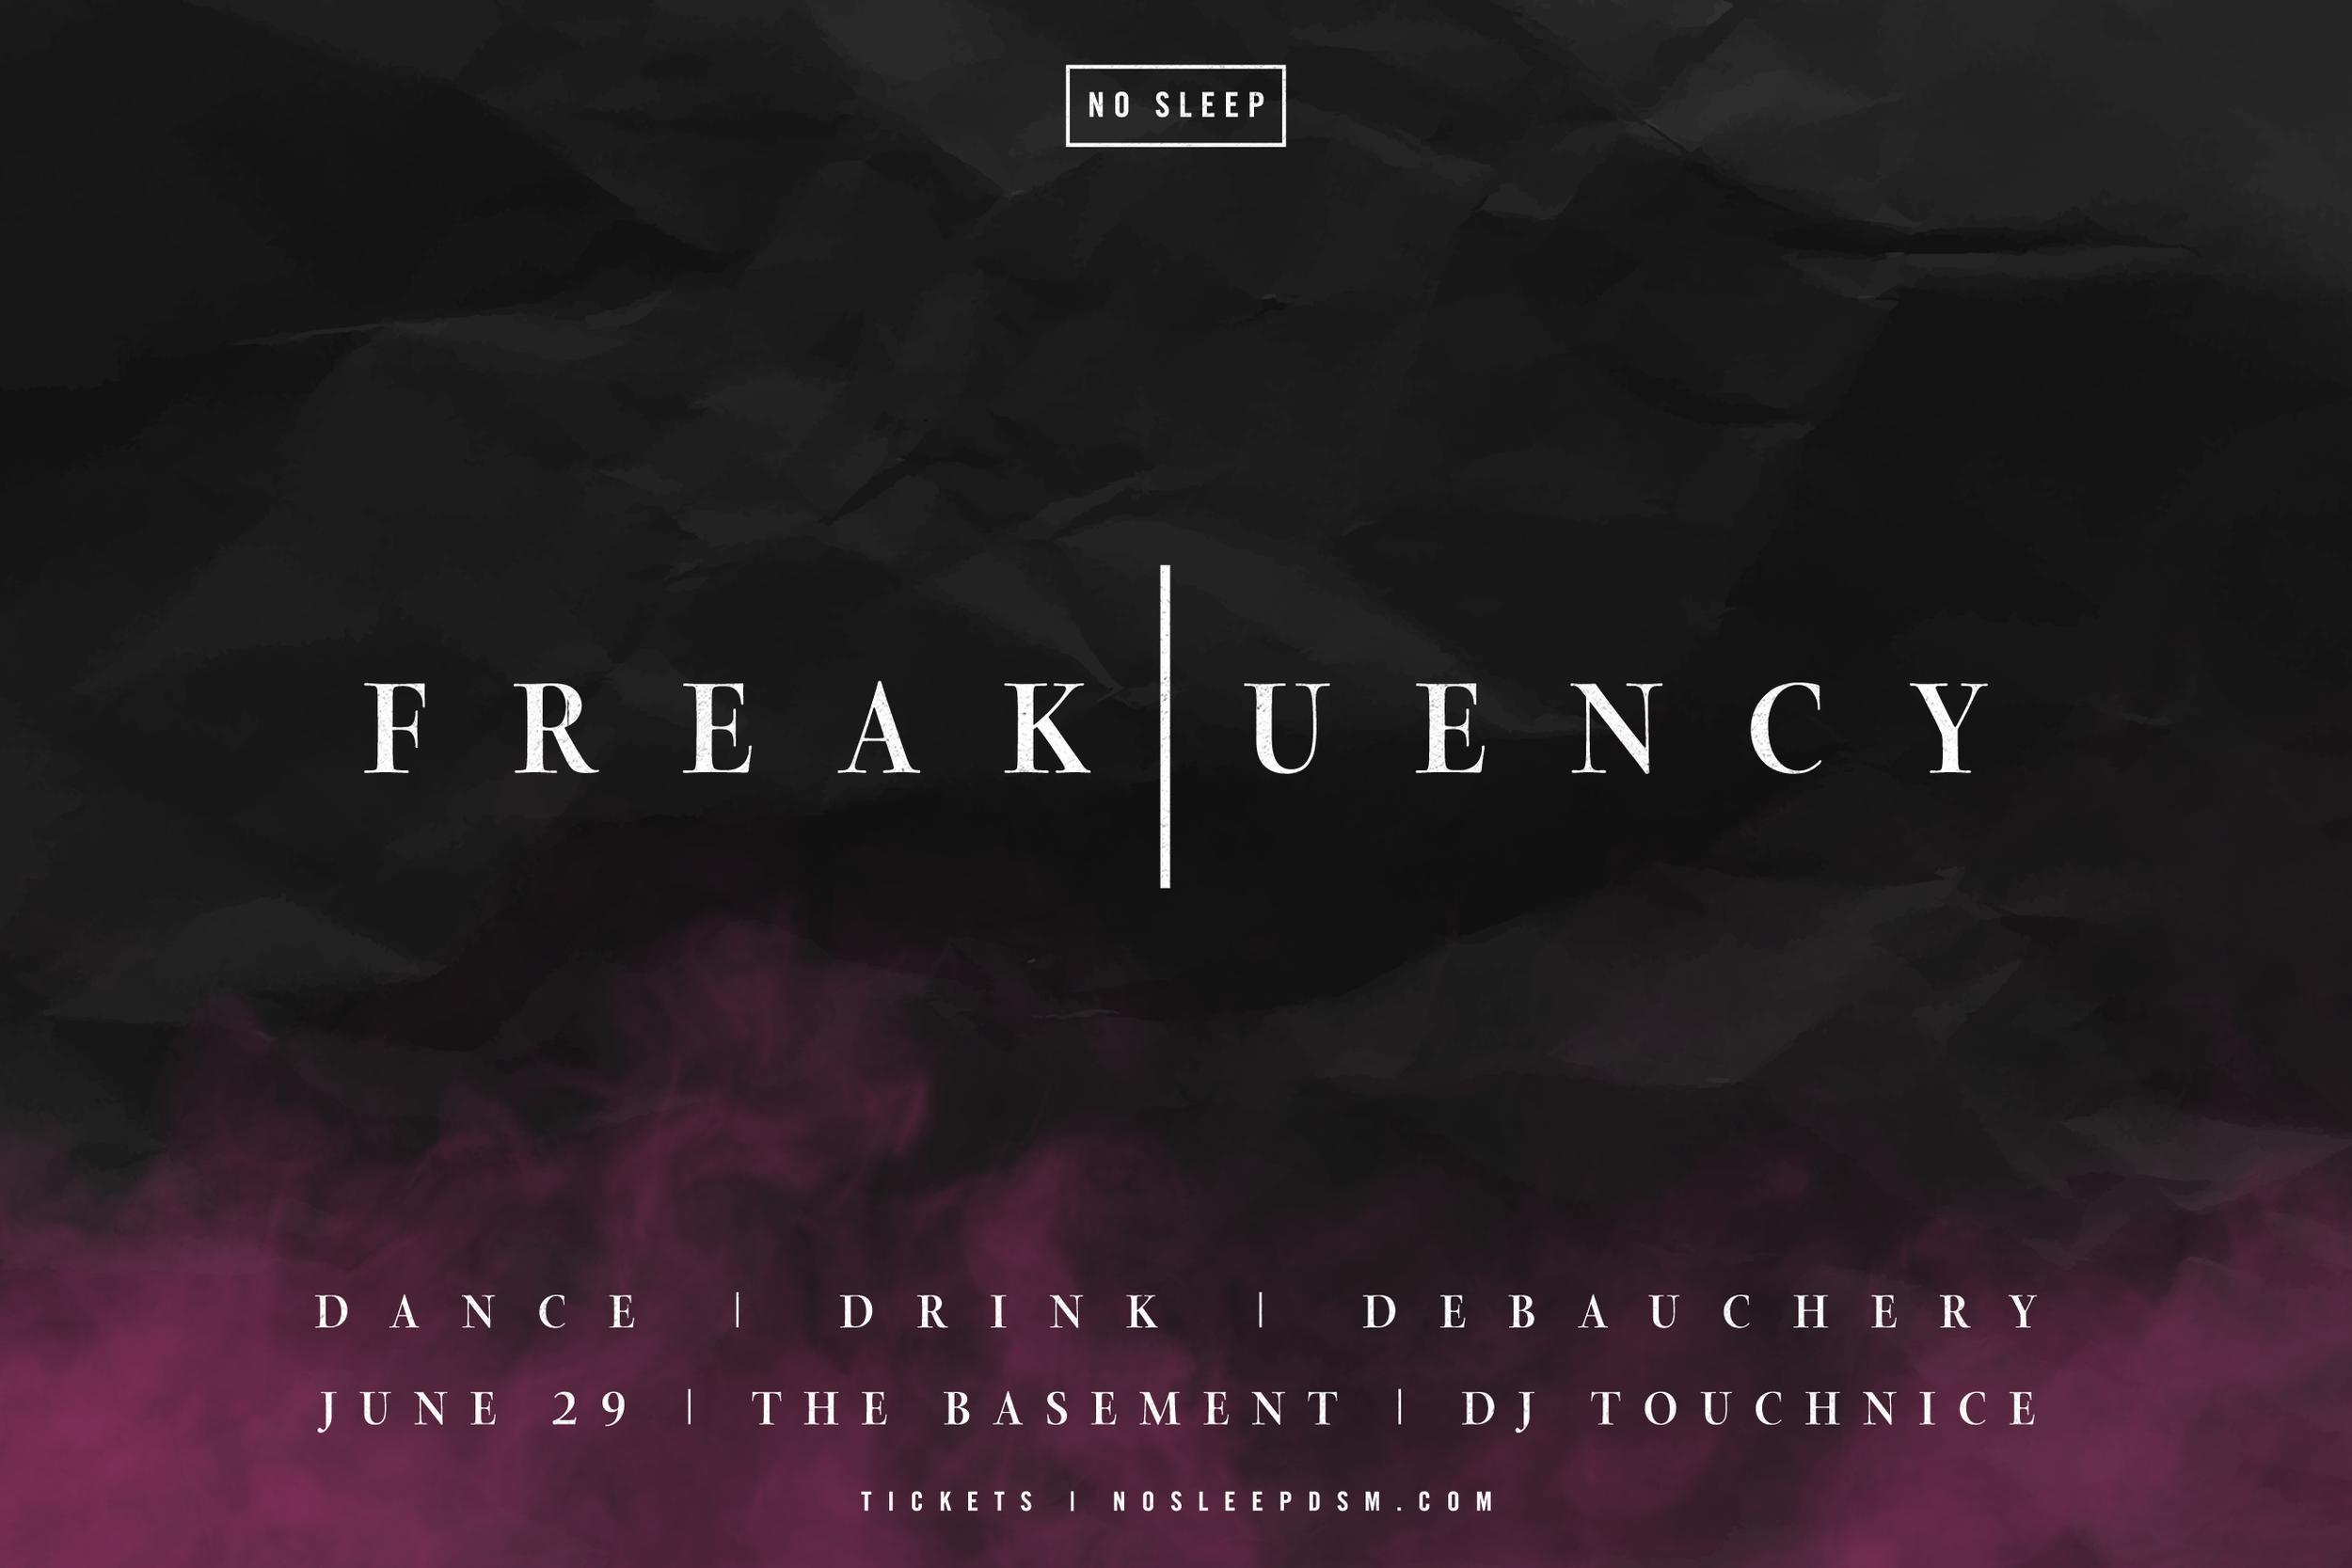 Freakuency_Poster_3.png